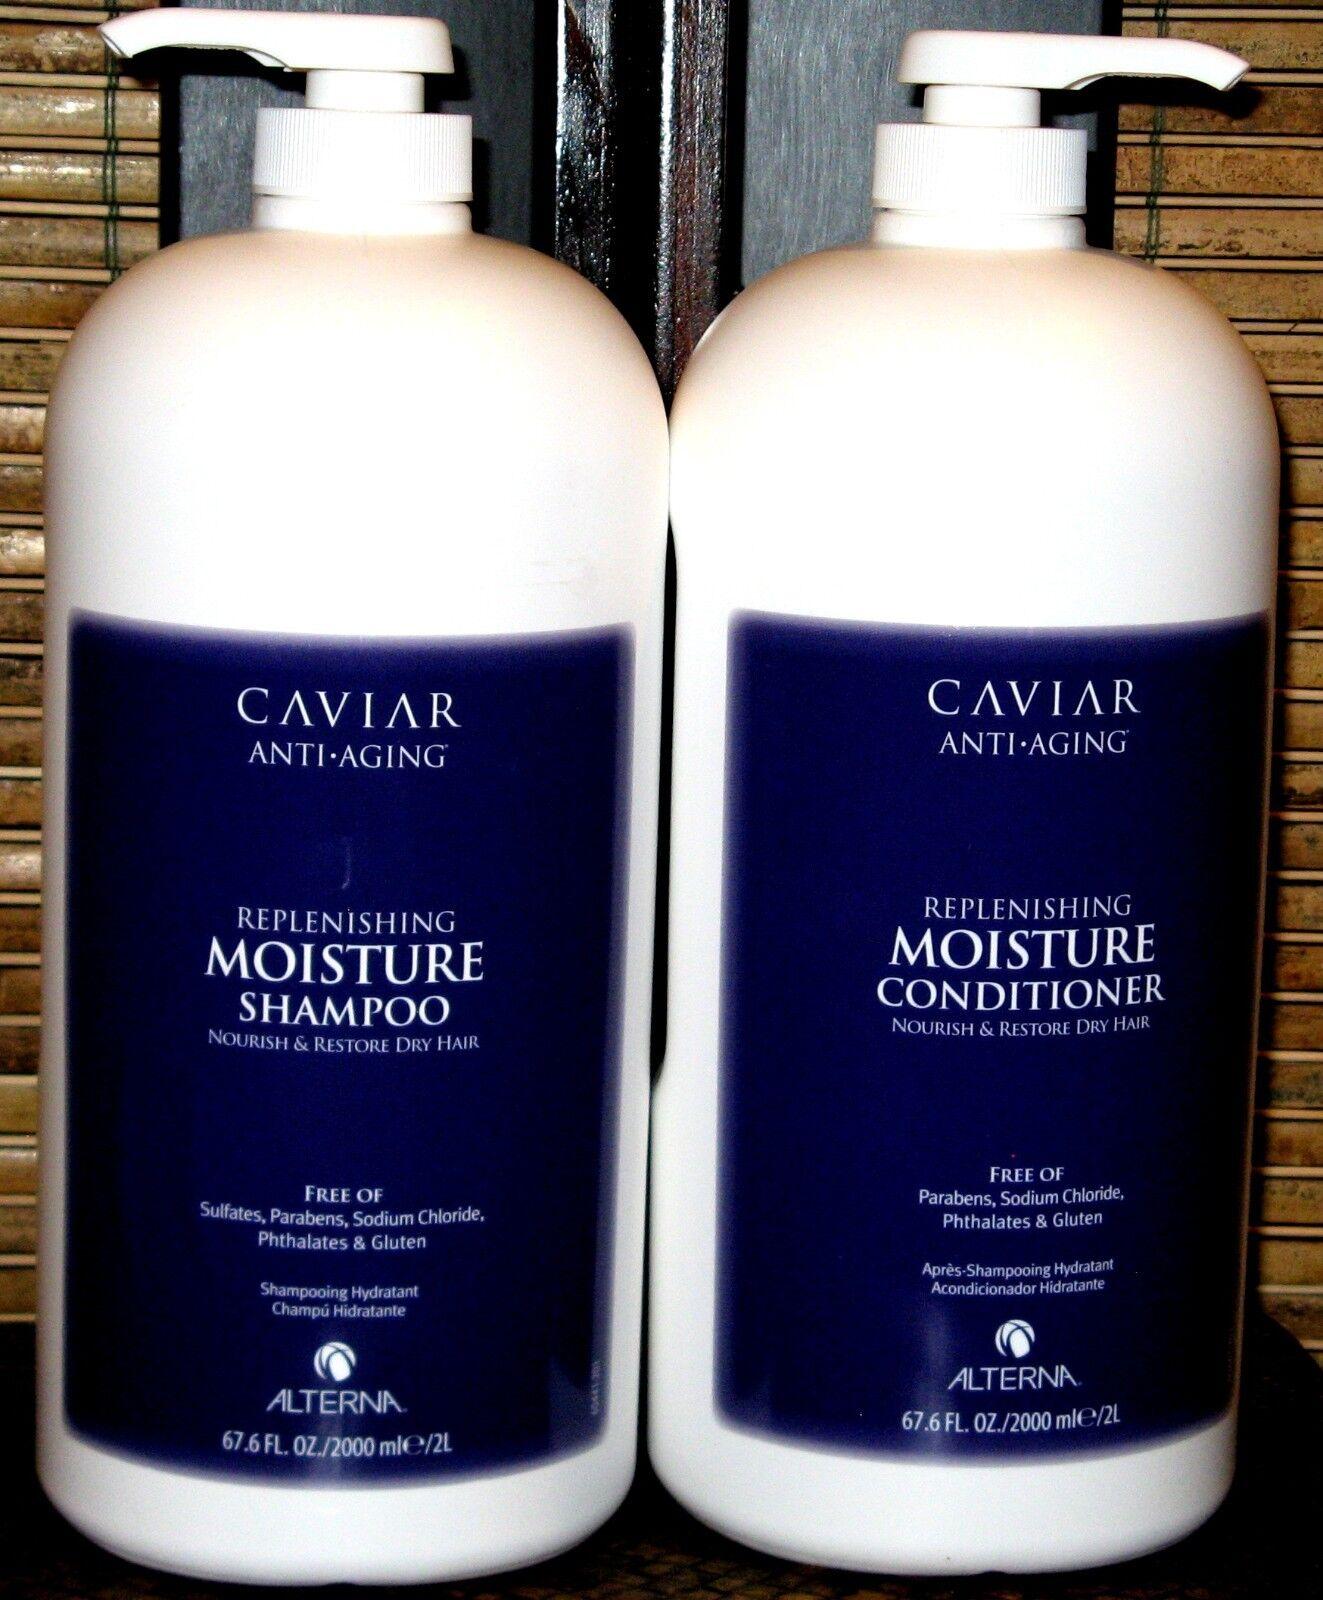 Alterna Caviar Moisture Shampoo & Conditioner 67.6 2 Liter Set Duo Half Gallon